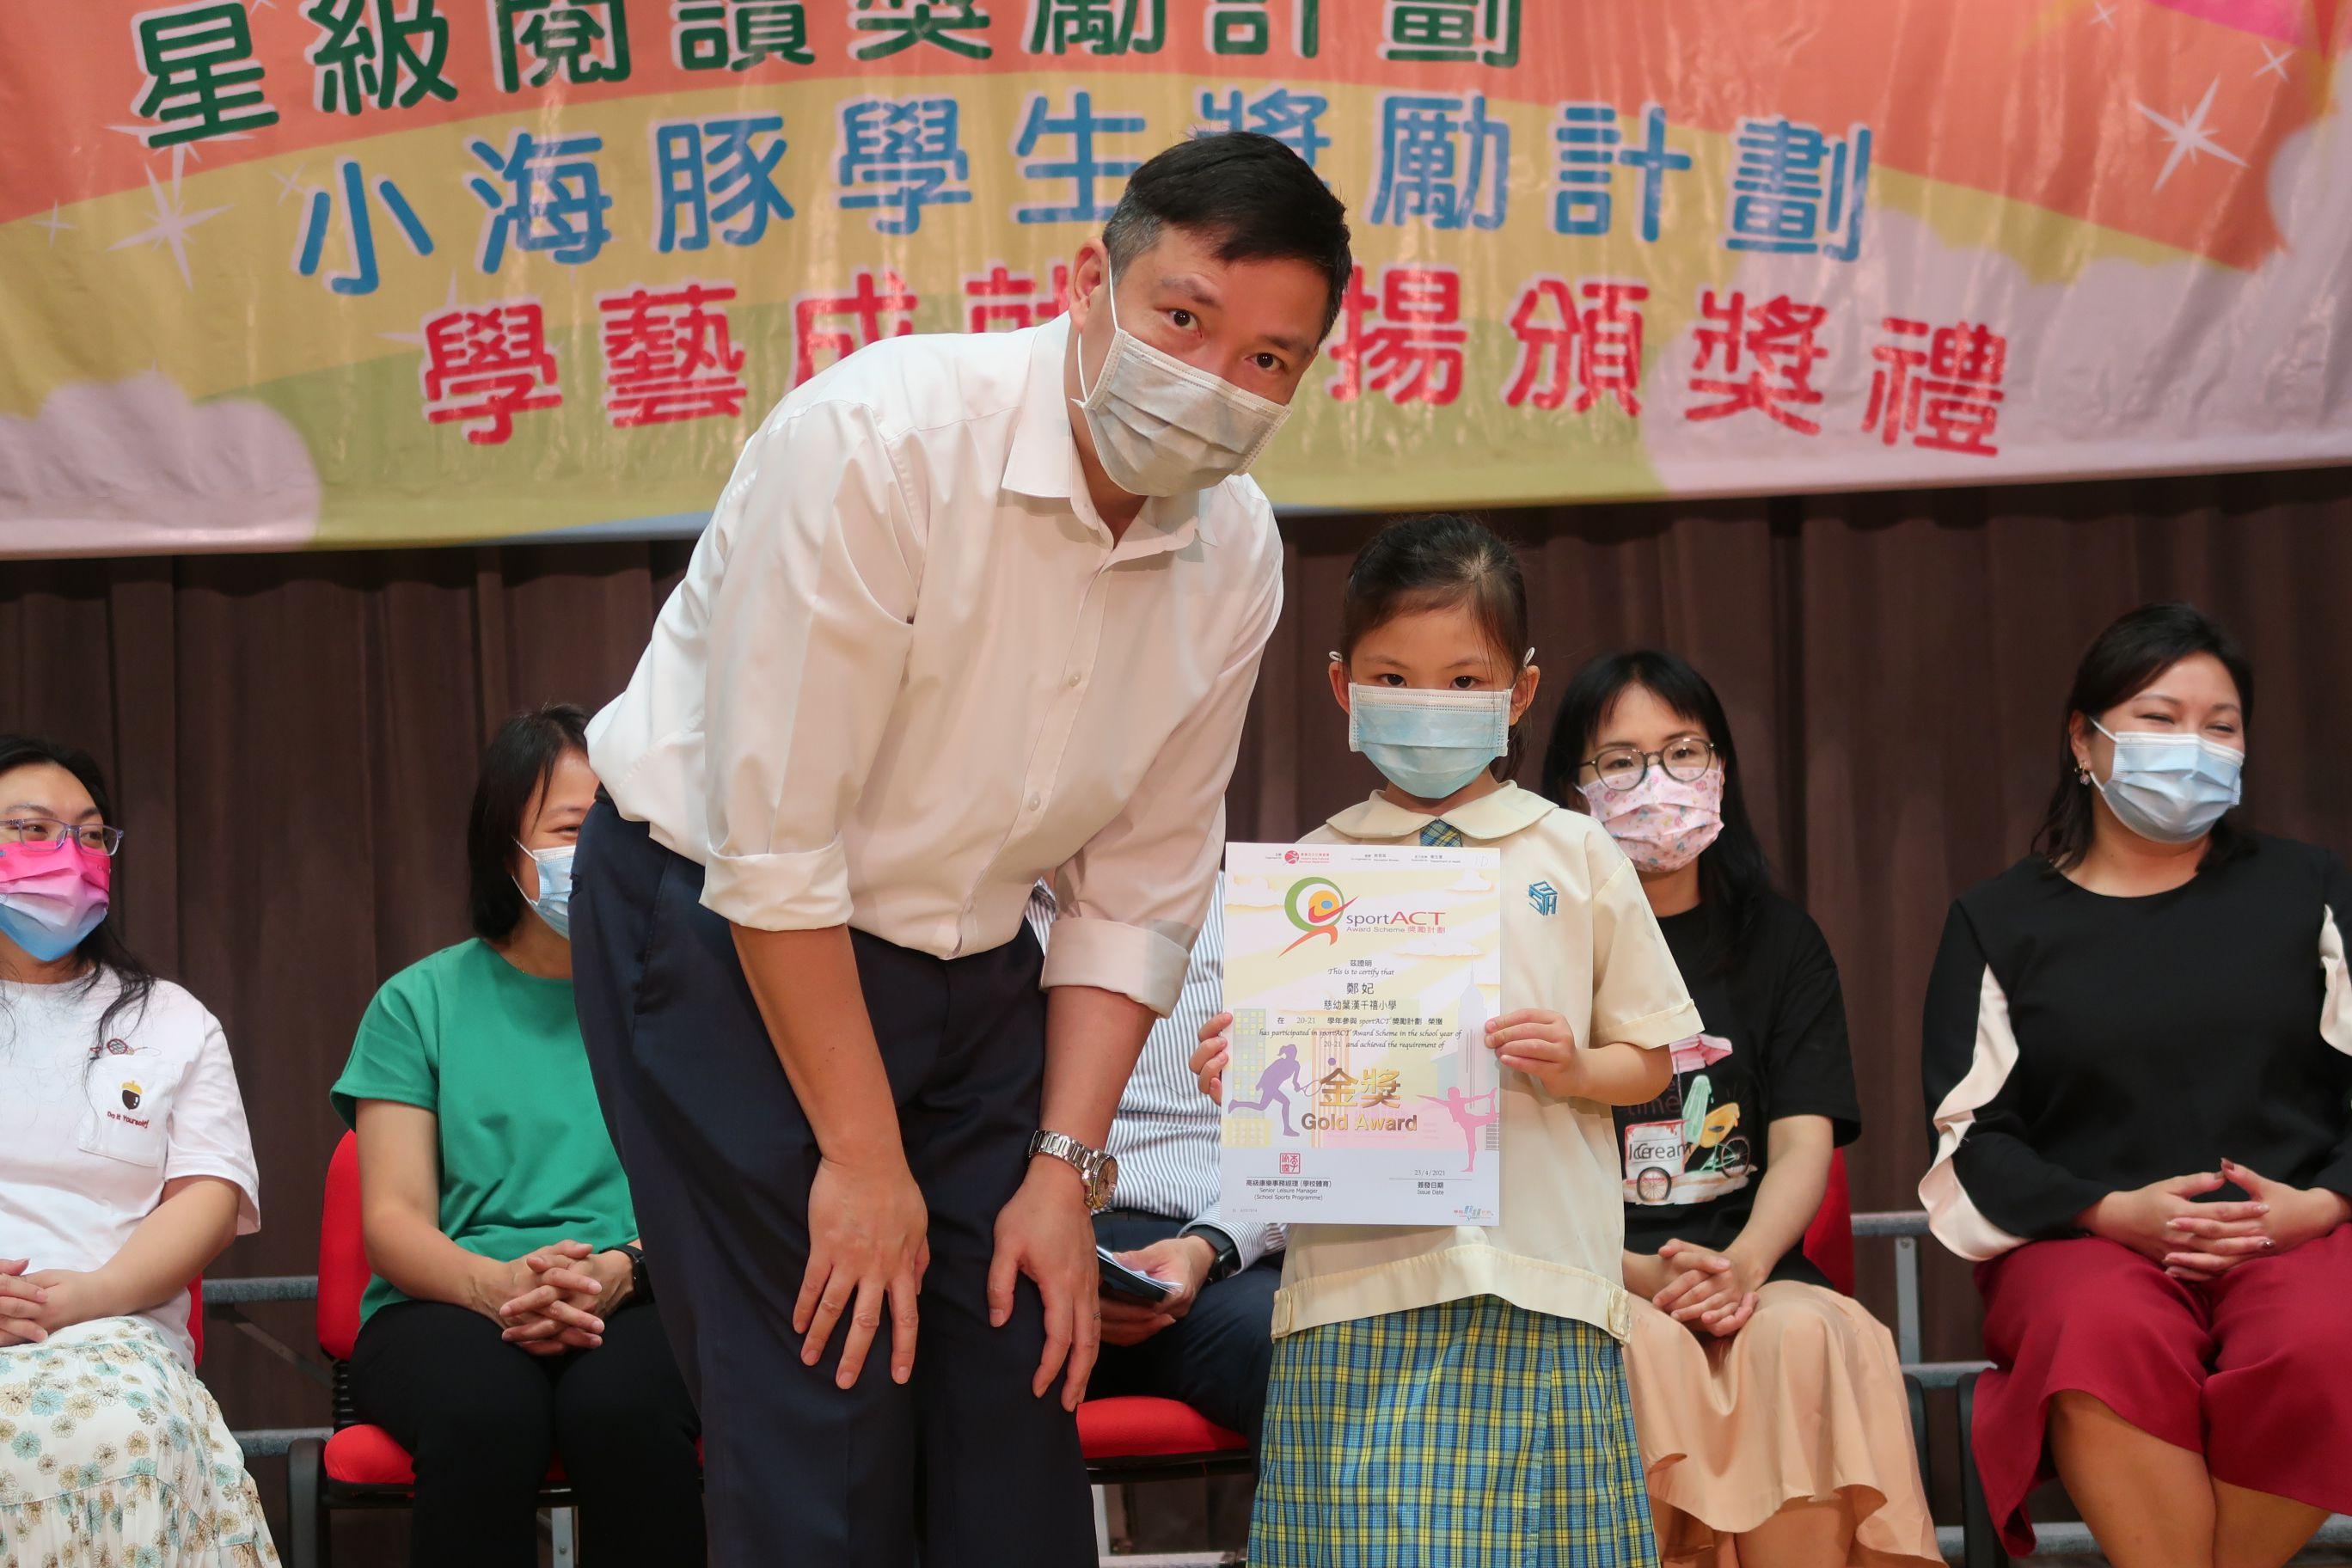 https://syh.edu.hk/sites/default/files/img_5888.jpg